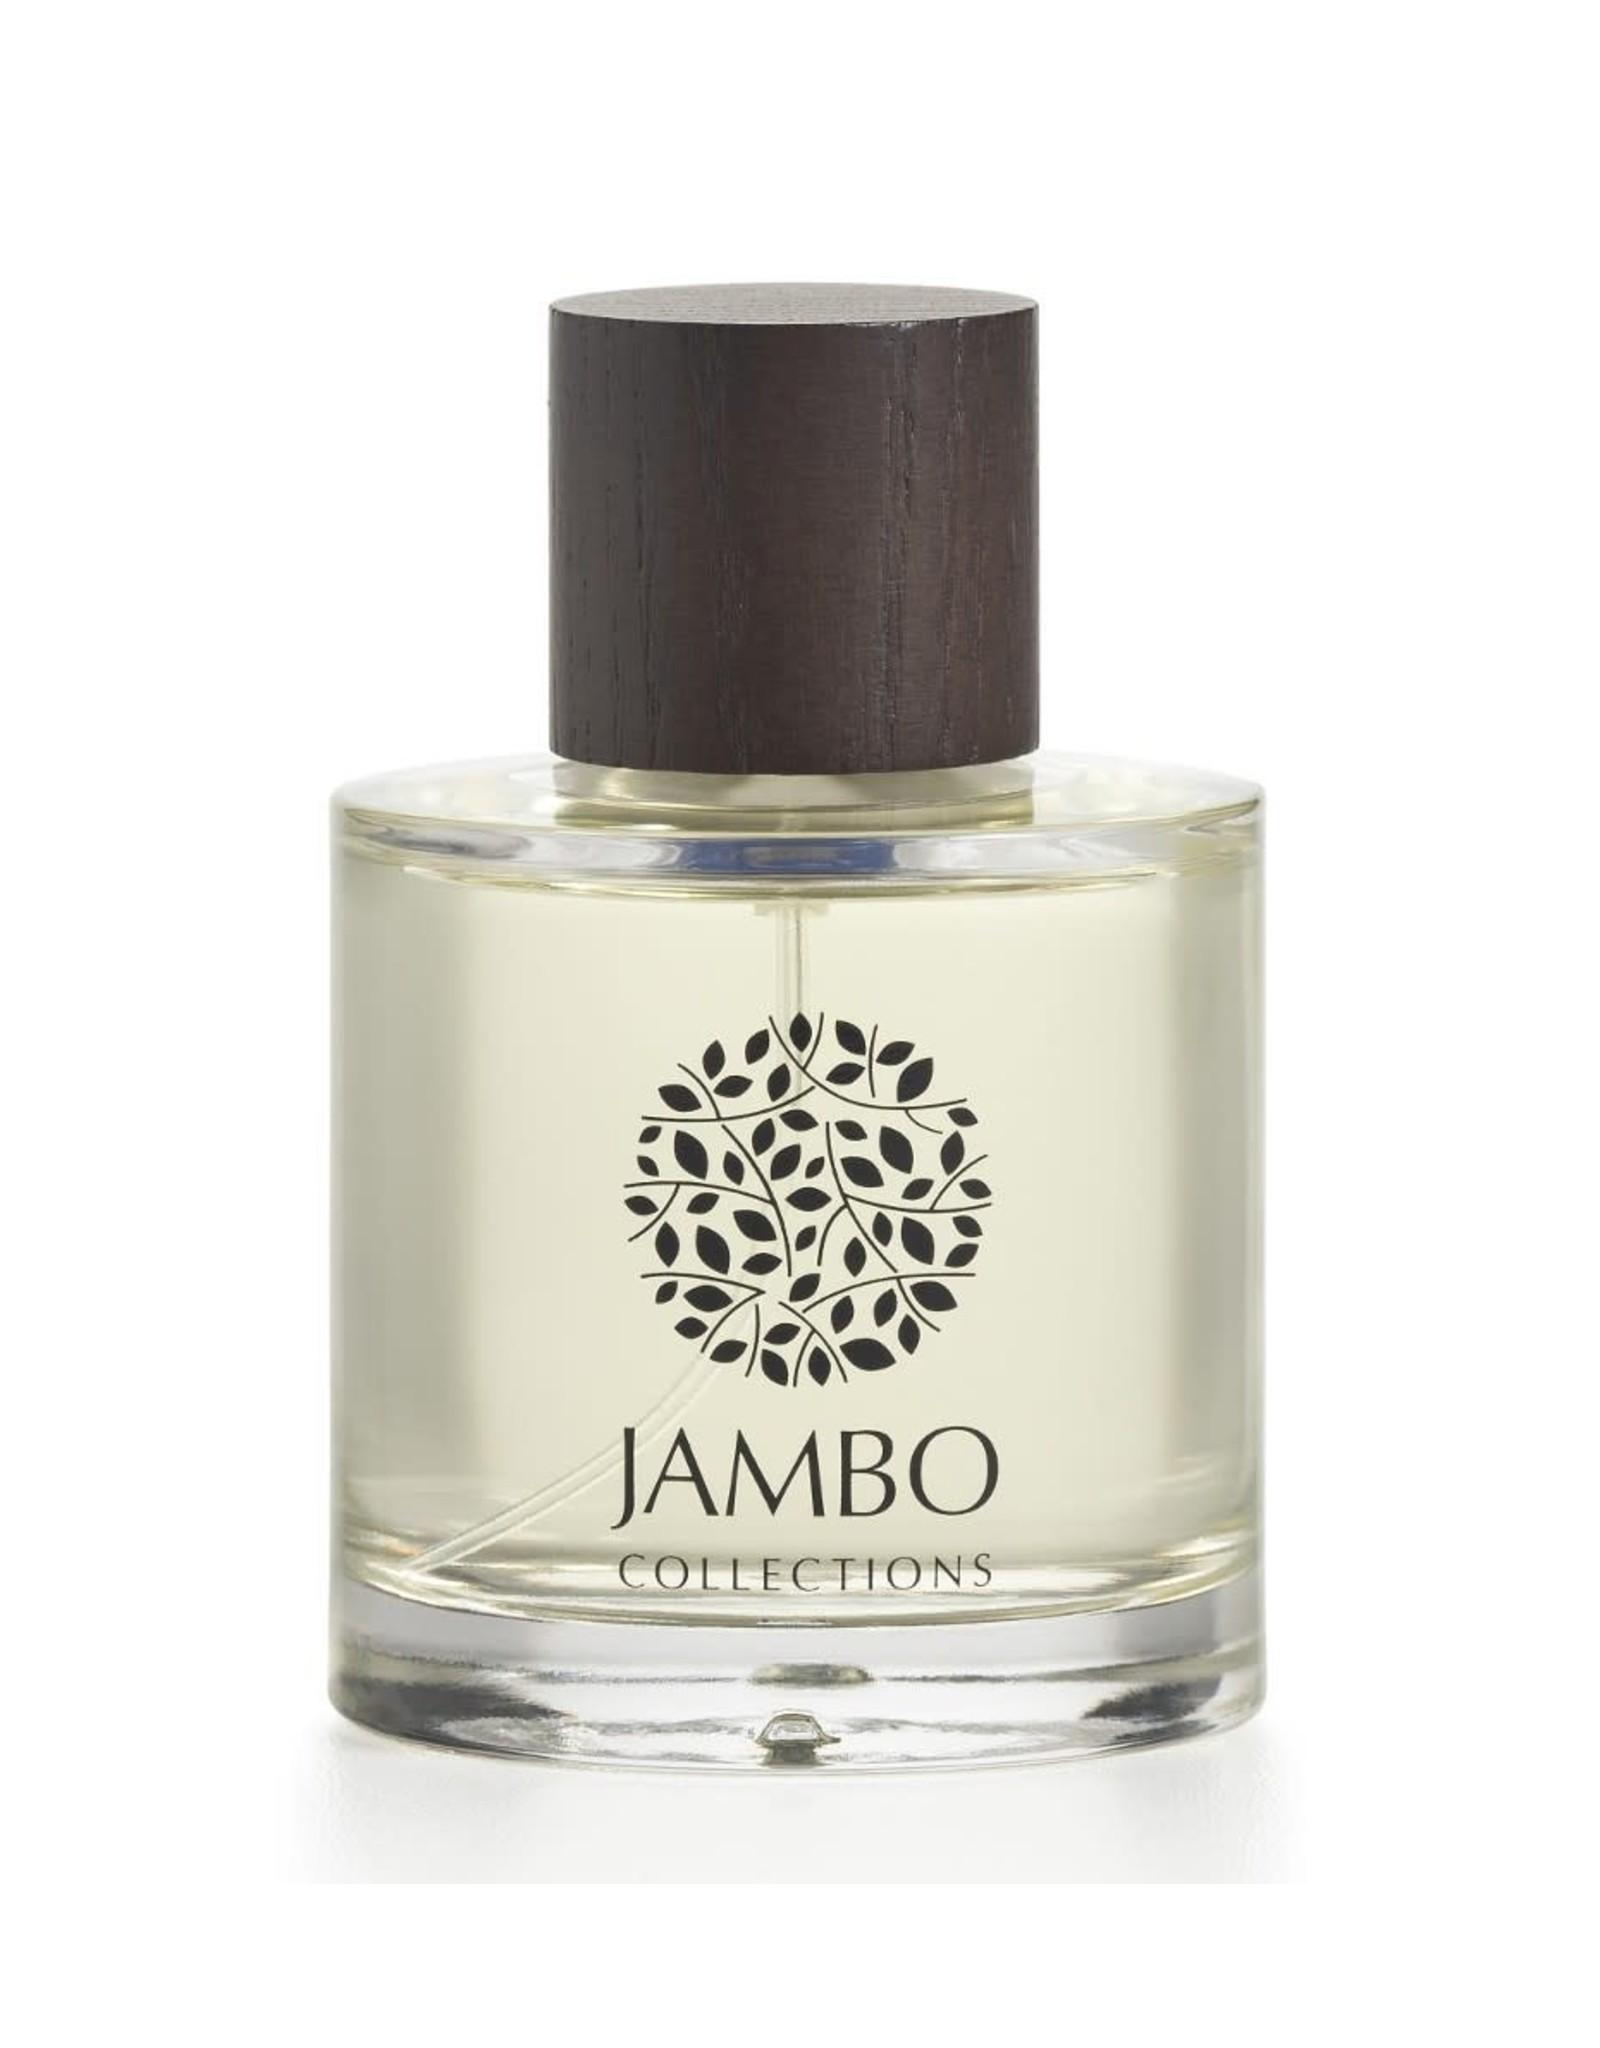 Jambo Collections Homespray Exclusivo Collection Namadgi 100ml